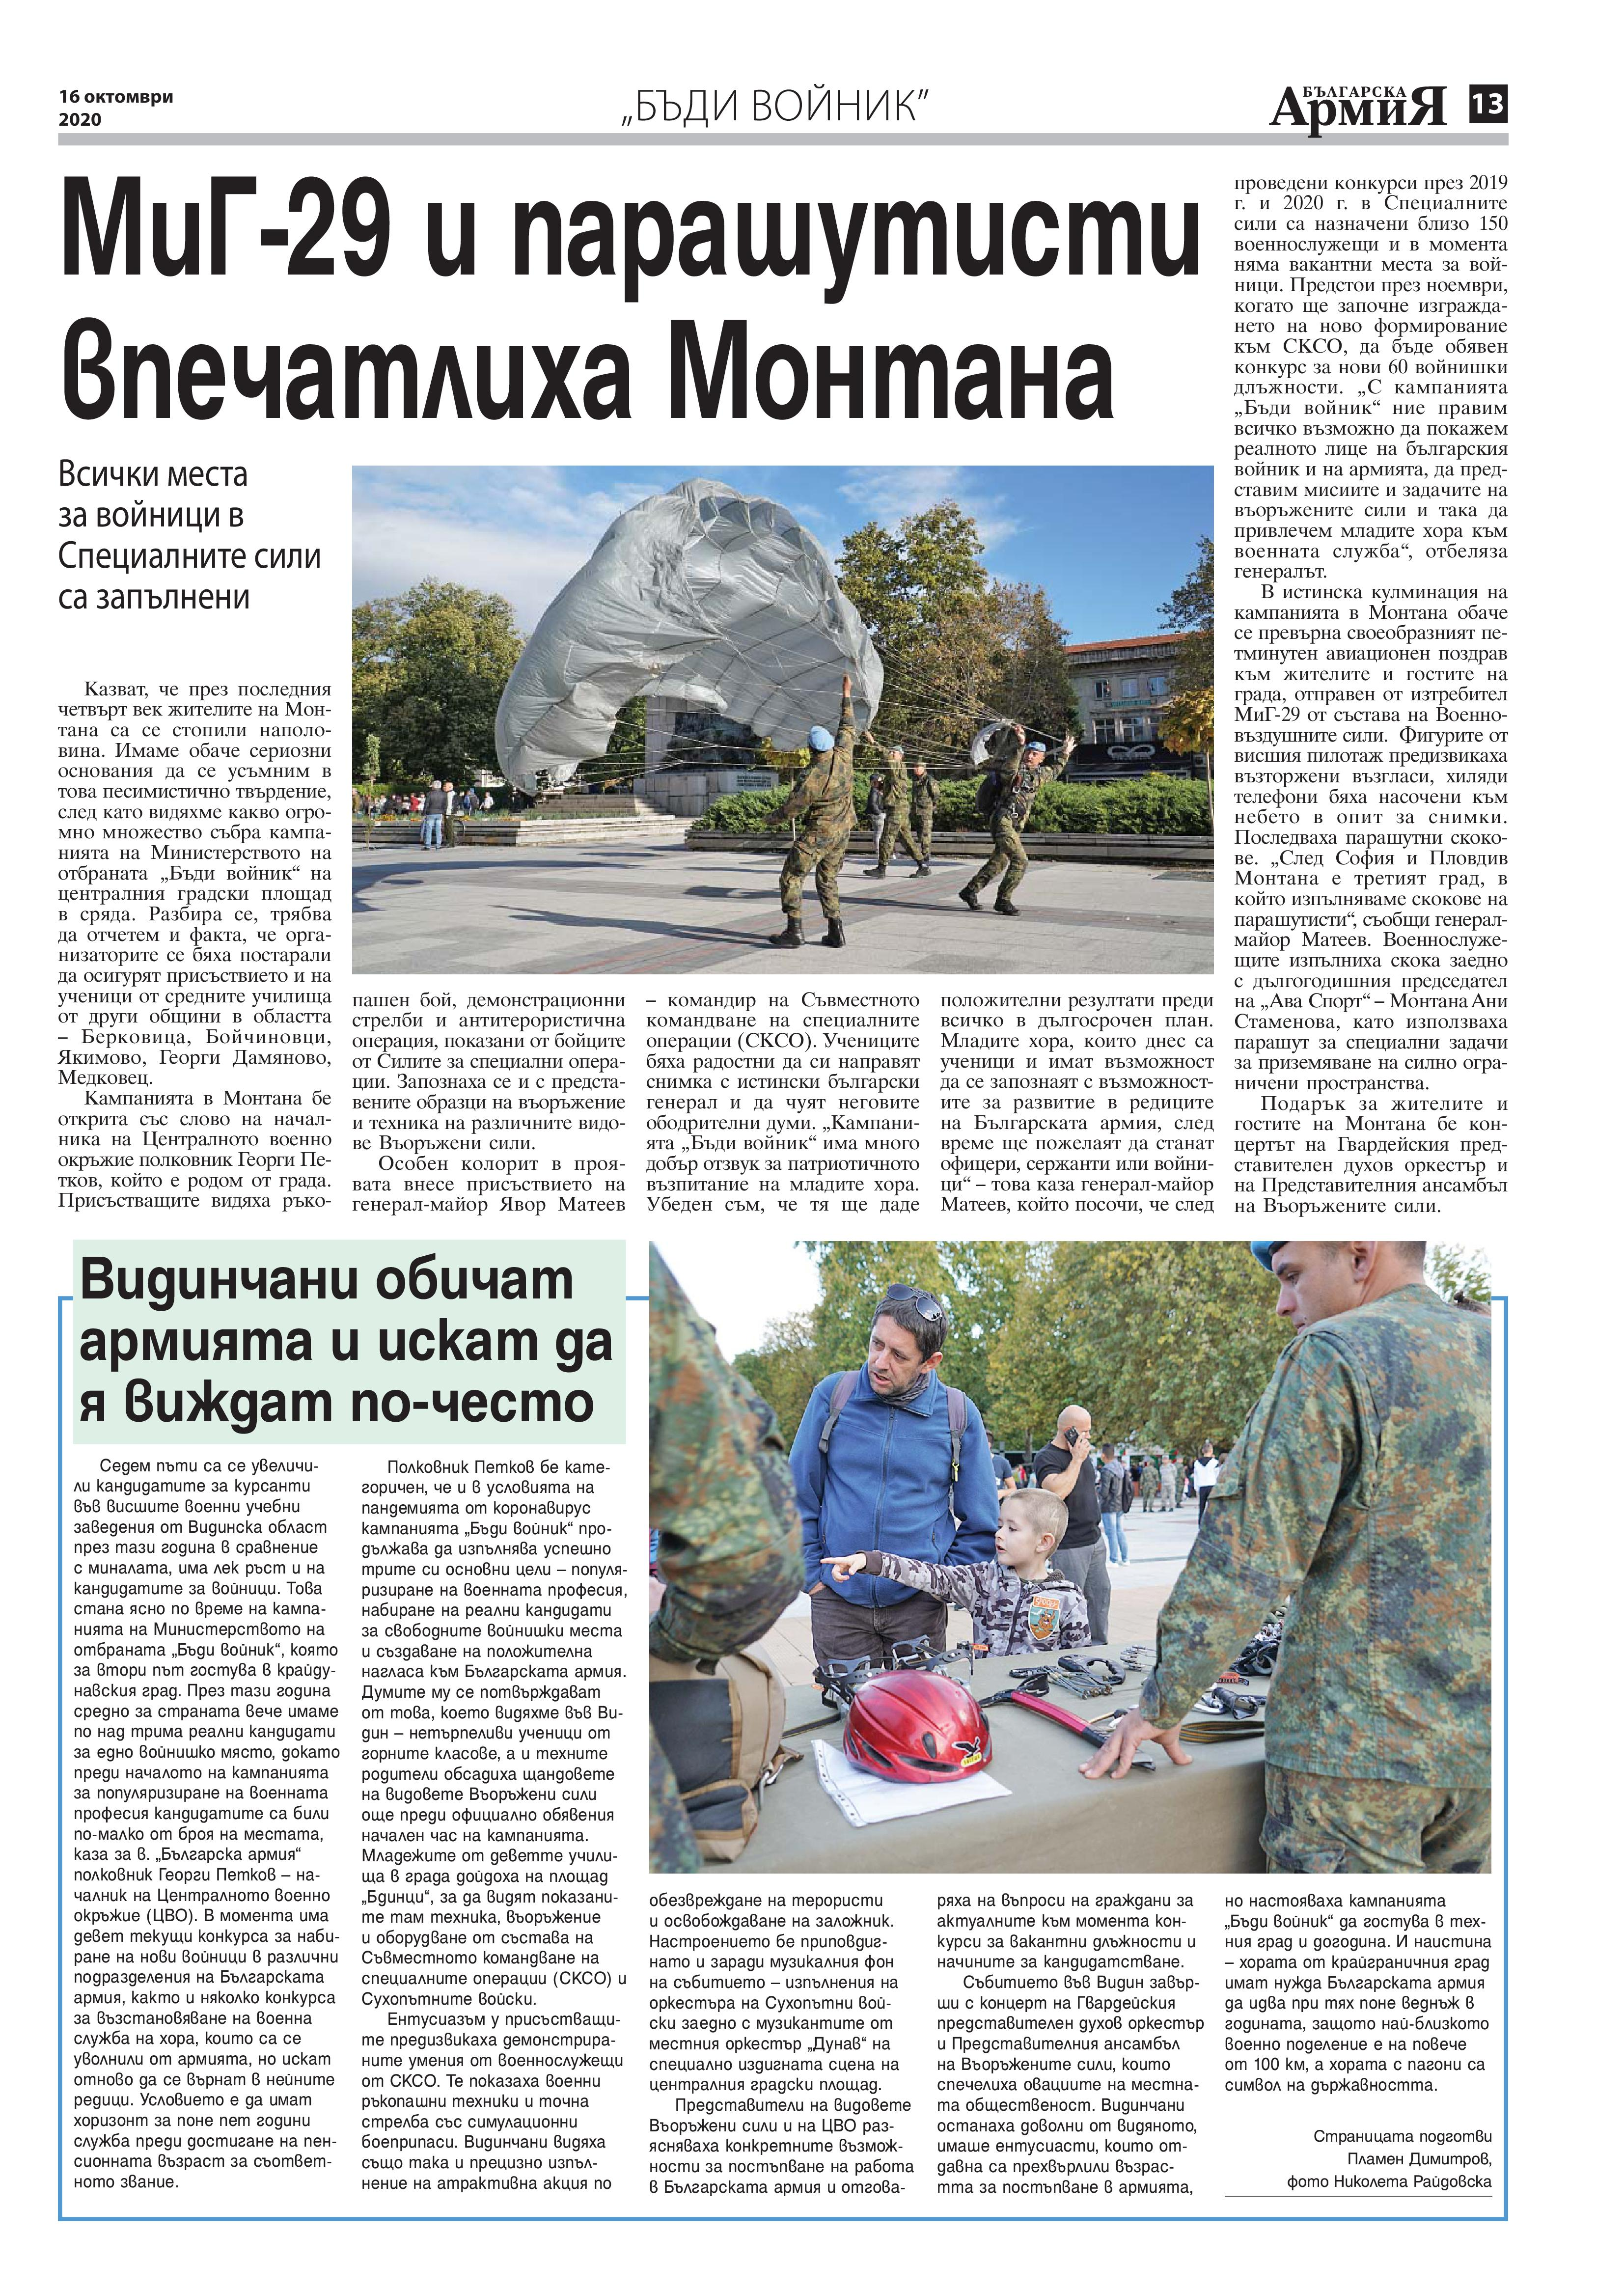 https://armymedia.bg/wp-content/uploads/2015/06/13-44.jpg